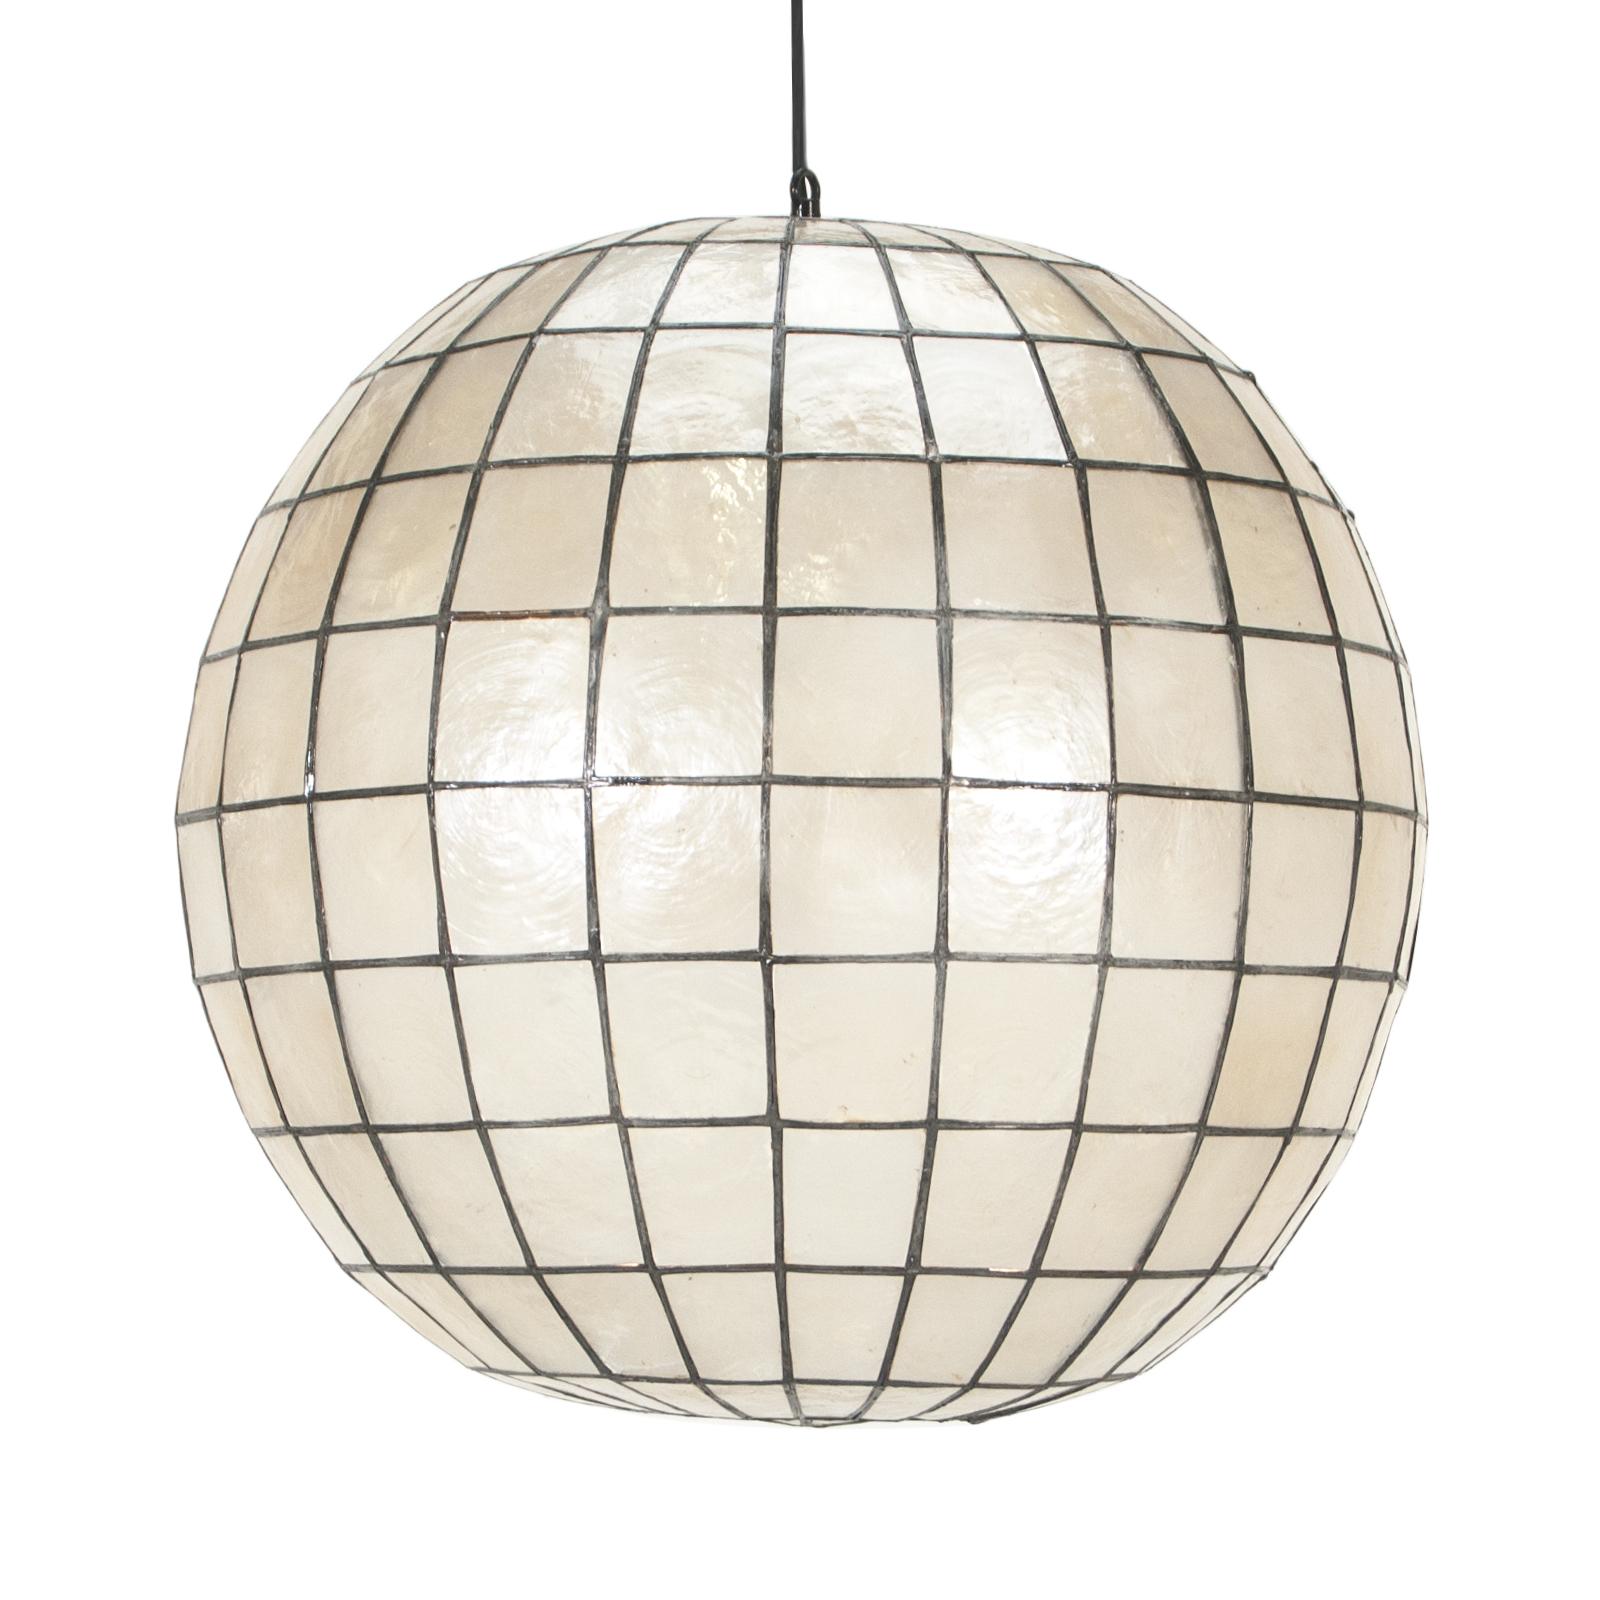 Pendant lighting rentals event lighting rental delivery formdecor shell globe pendant aloadofball Gallery